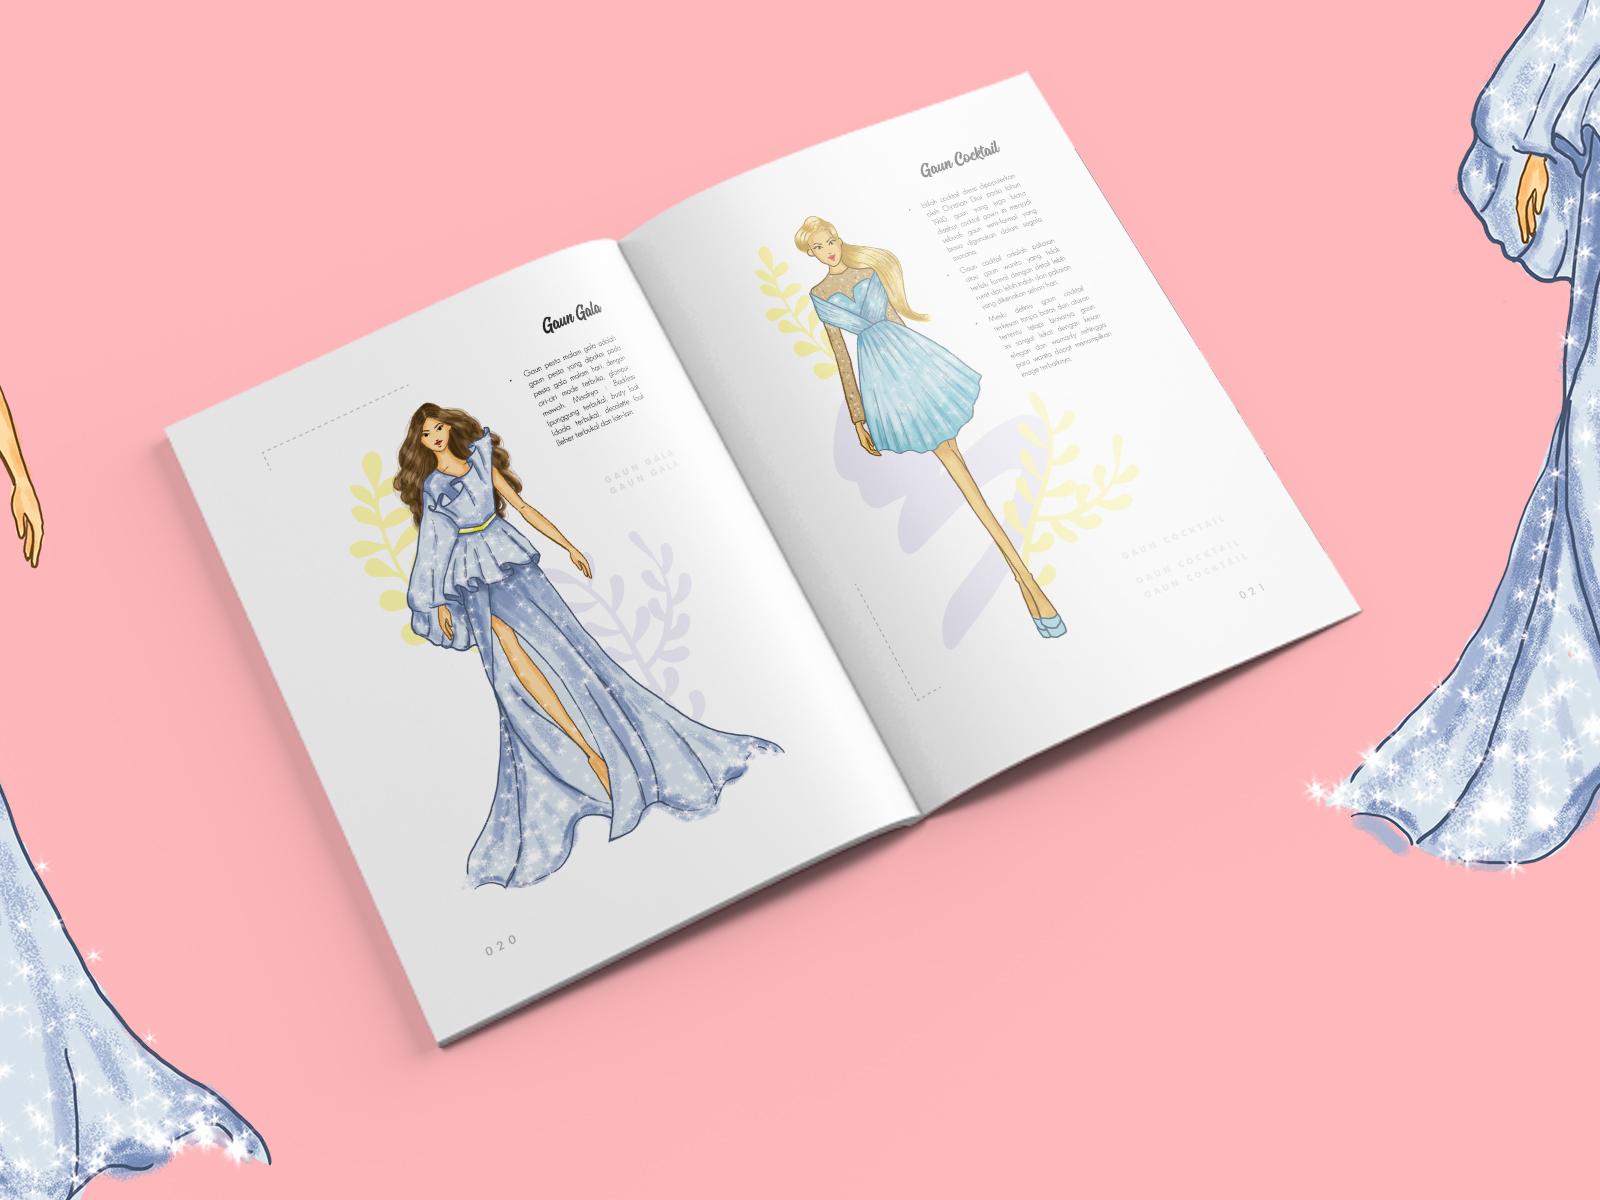 Basic Fashion Drawing Book By Umi Kaltsum For Visual Kreasi On Dribbble